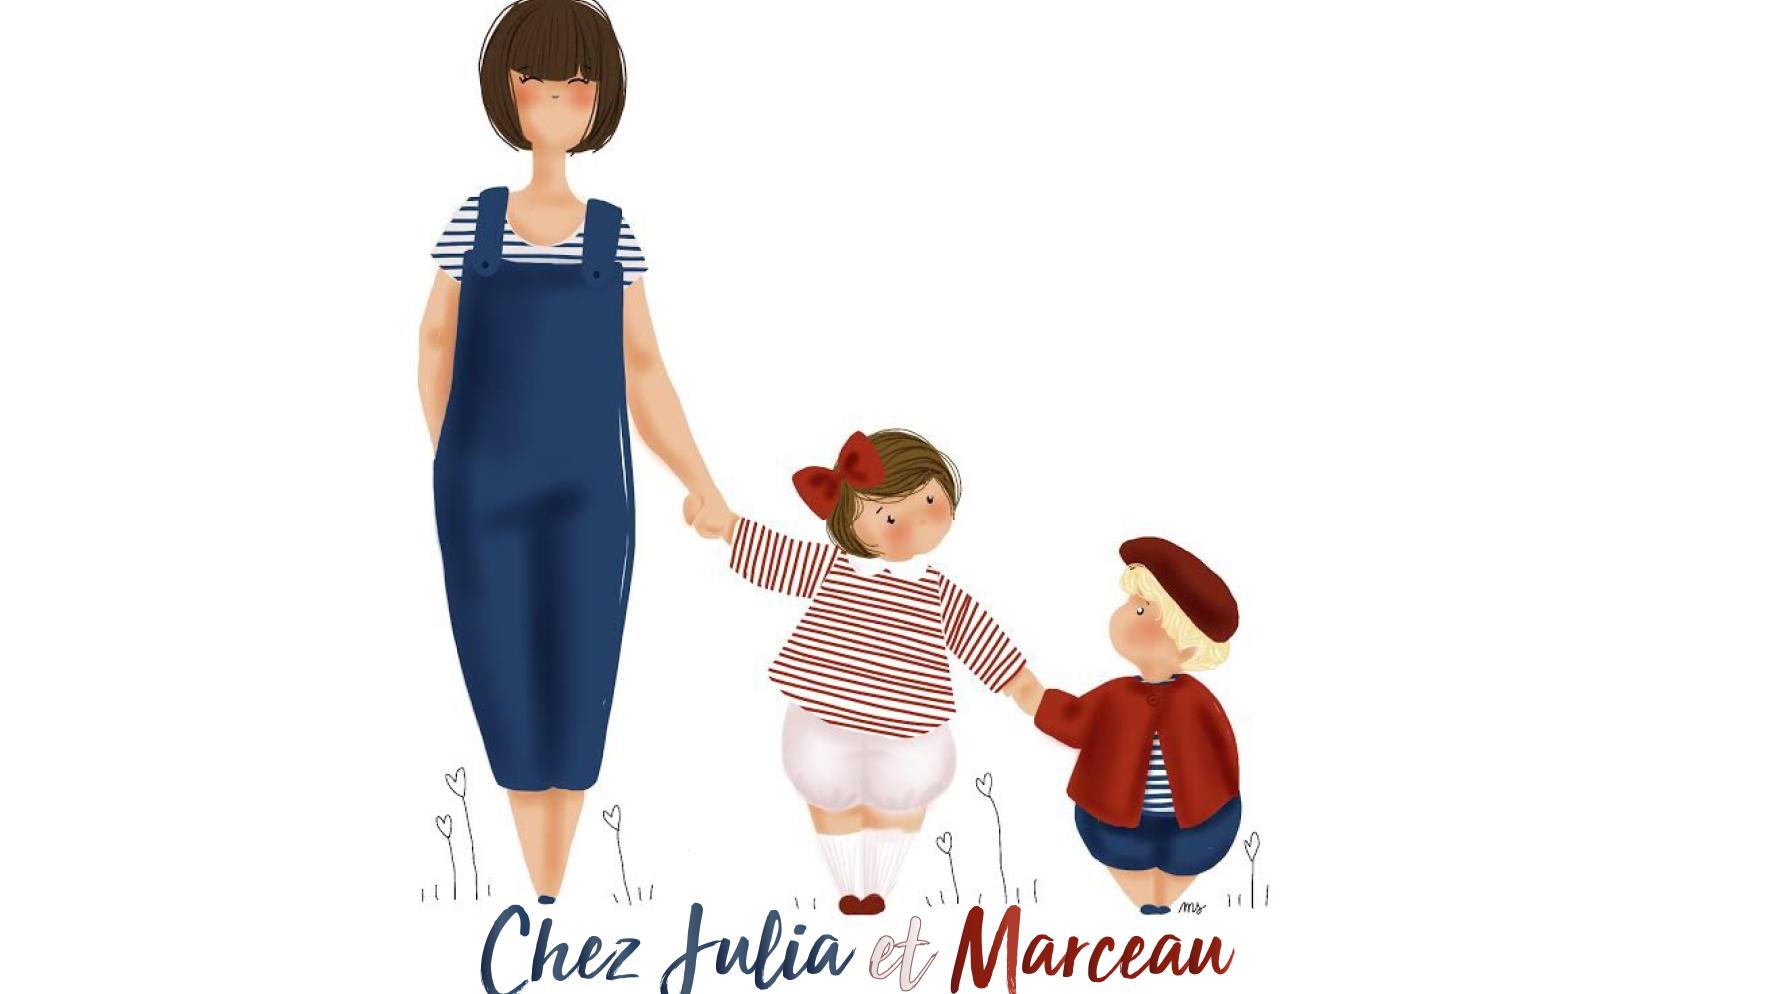 LOGO_-_Chez_Julia_et_Marceau-1523899502.jpg